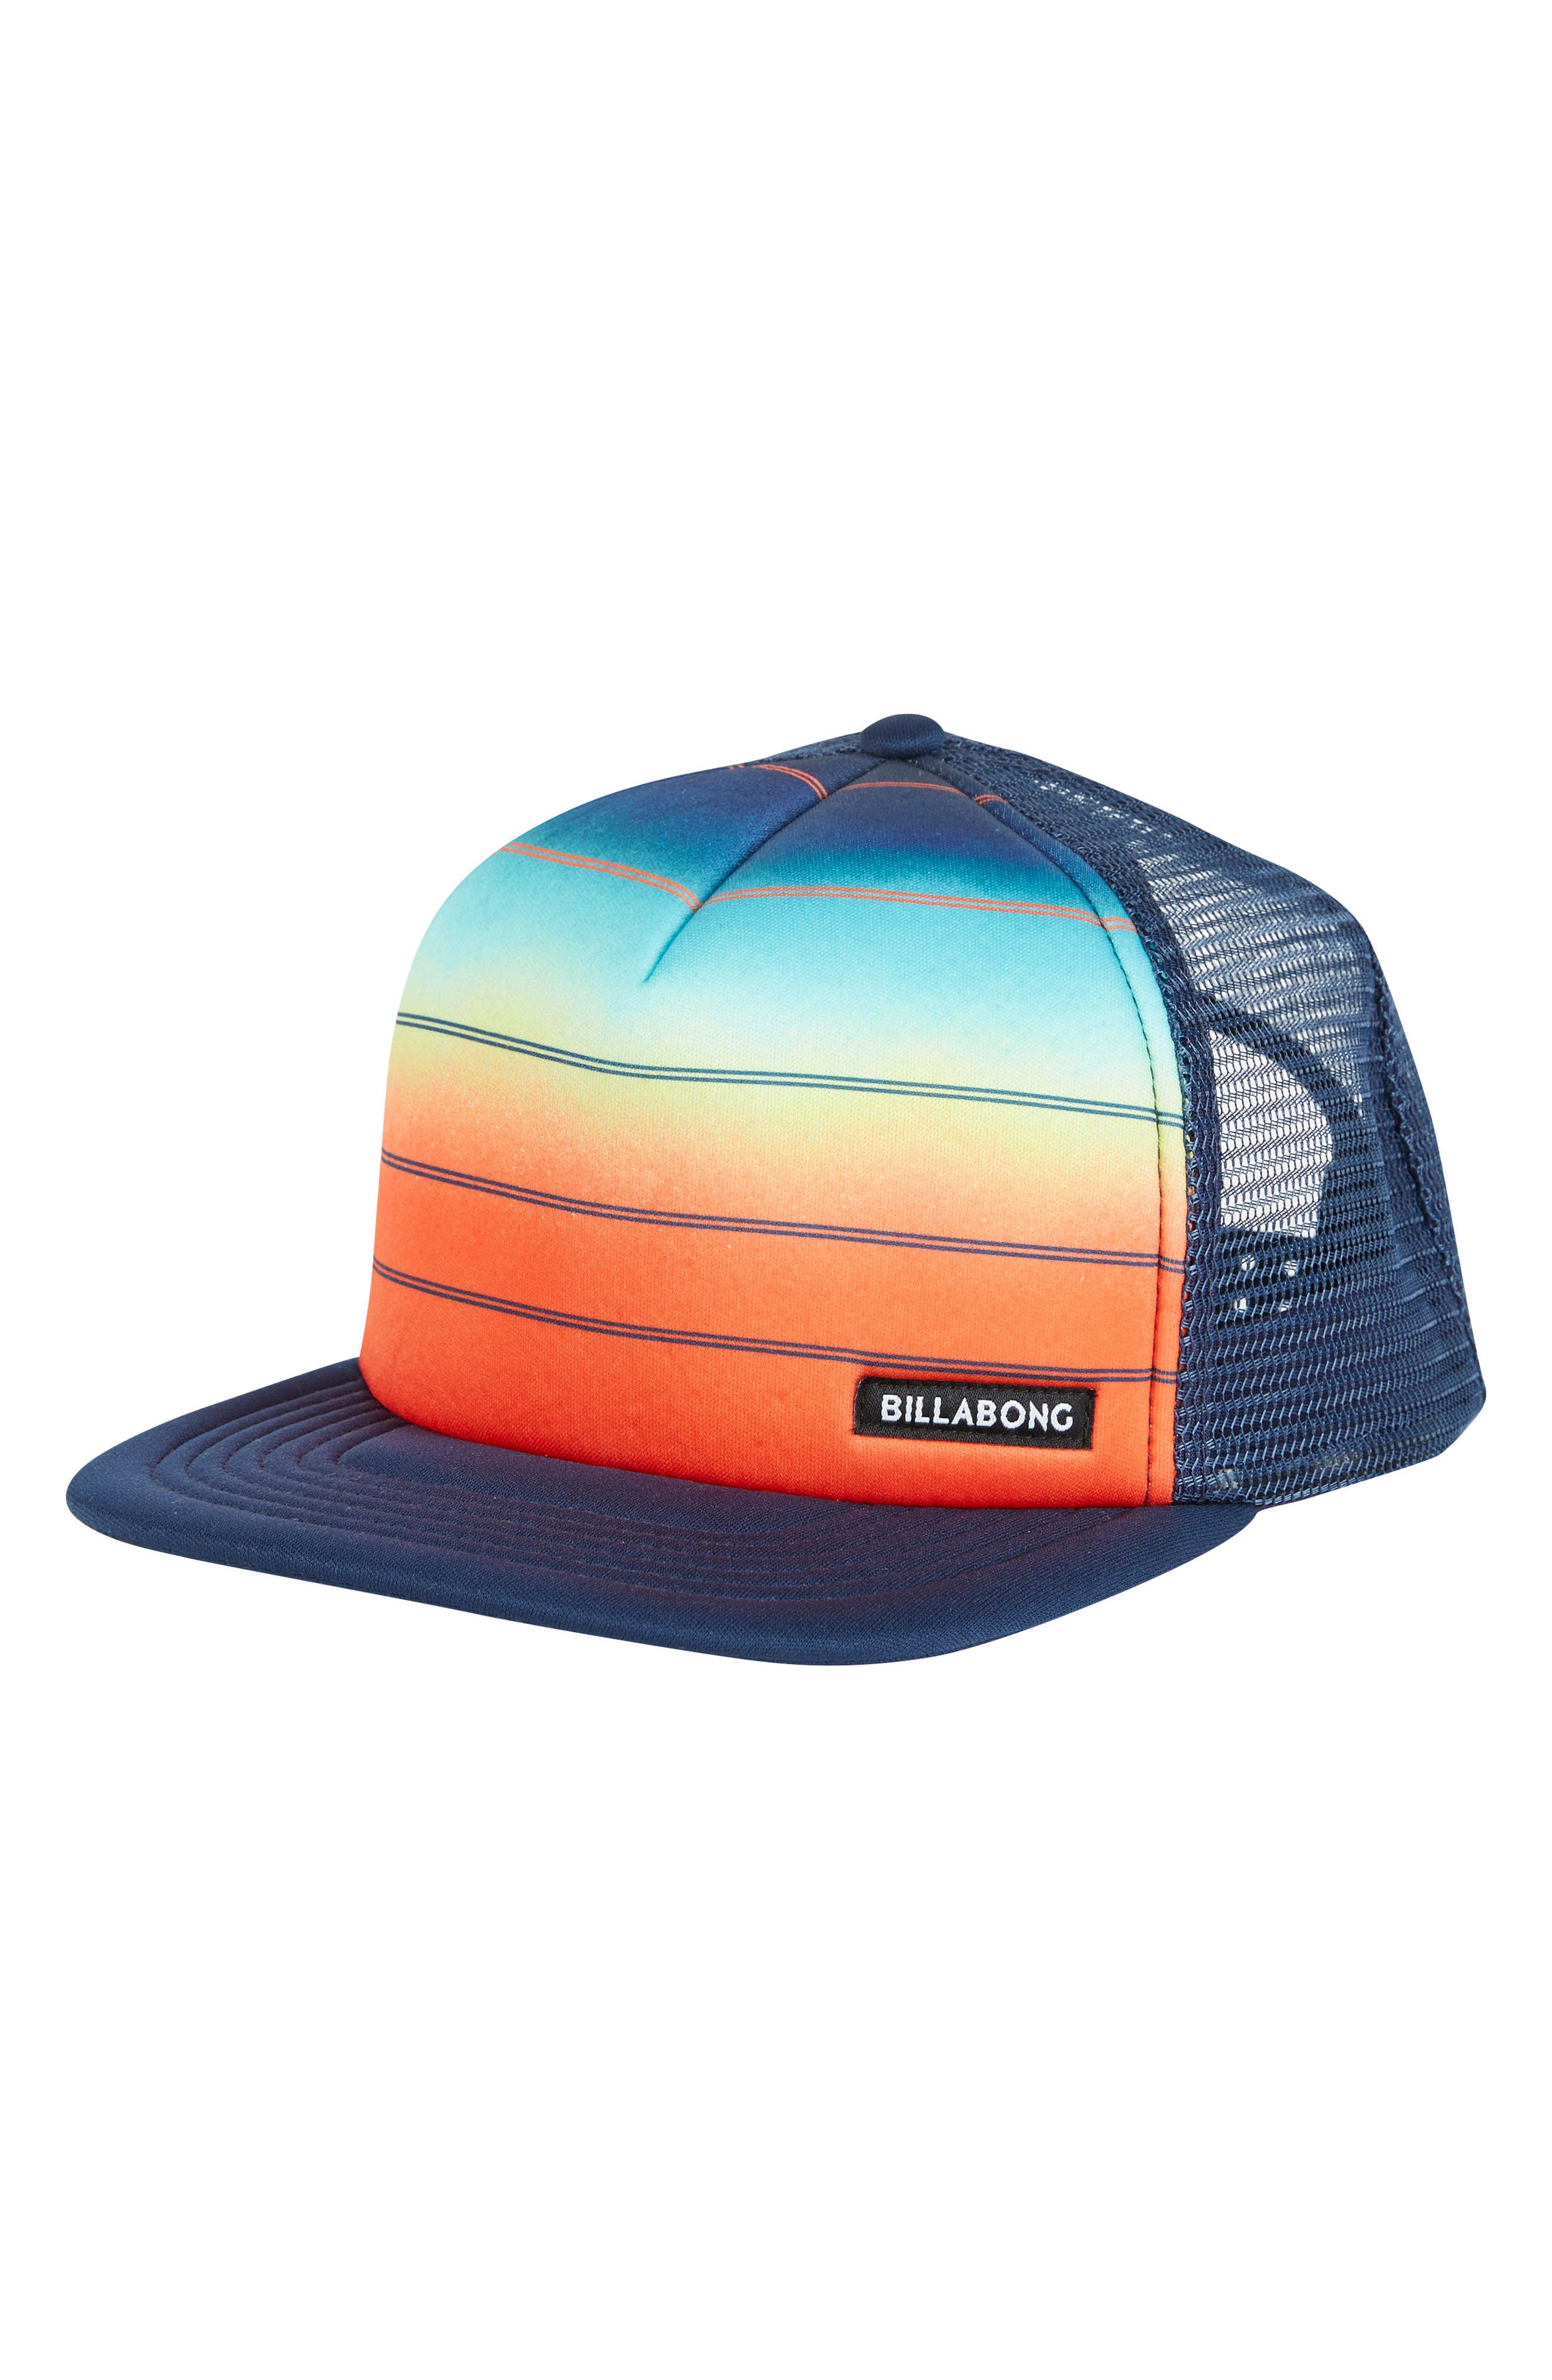 73 Snapback Trucker Hat,                             Main thumbnail 1, color,                             Orange